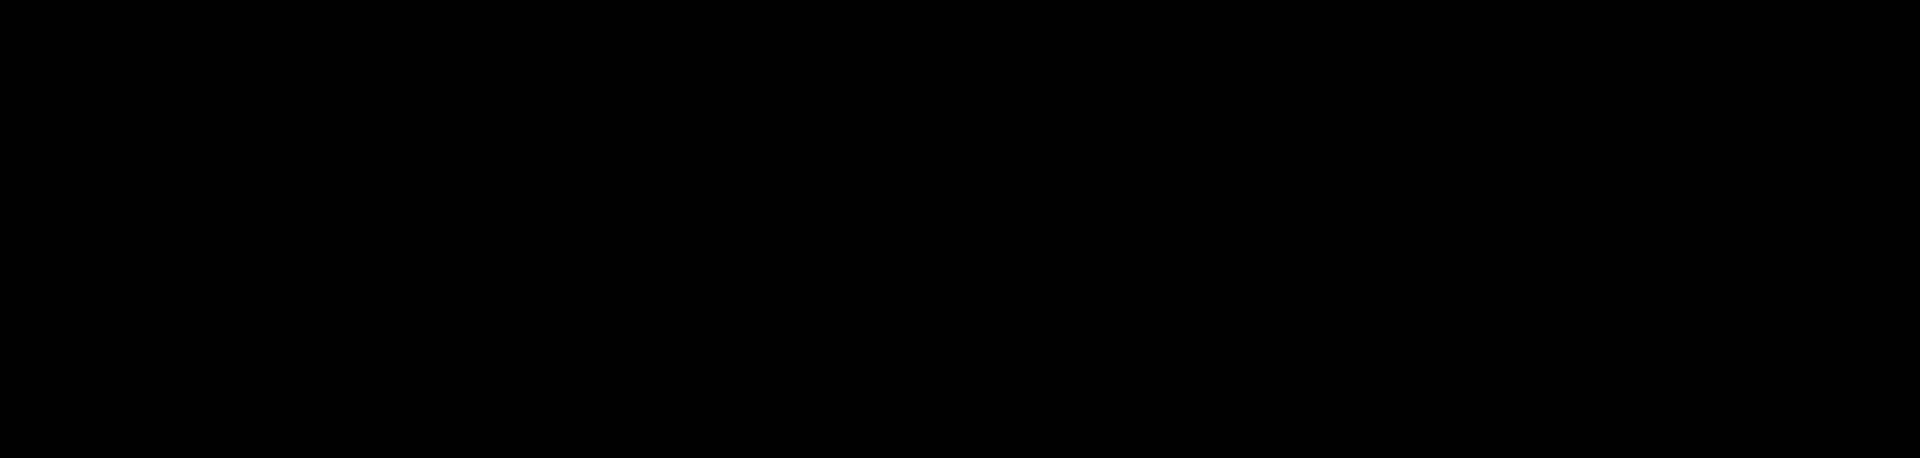 FunktionSchnitt_Logo_Herrenzimmer Potsdam